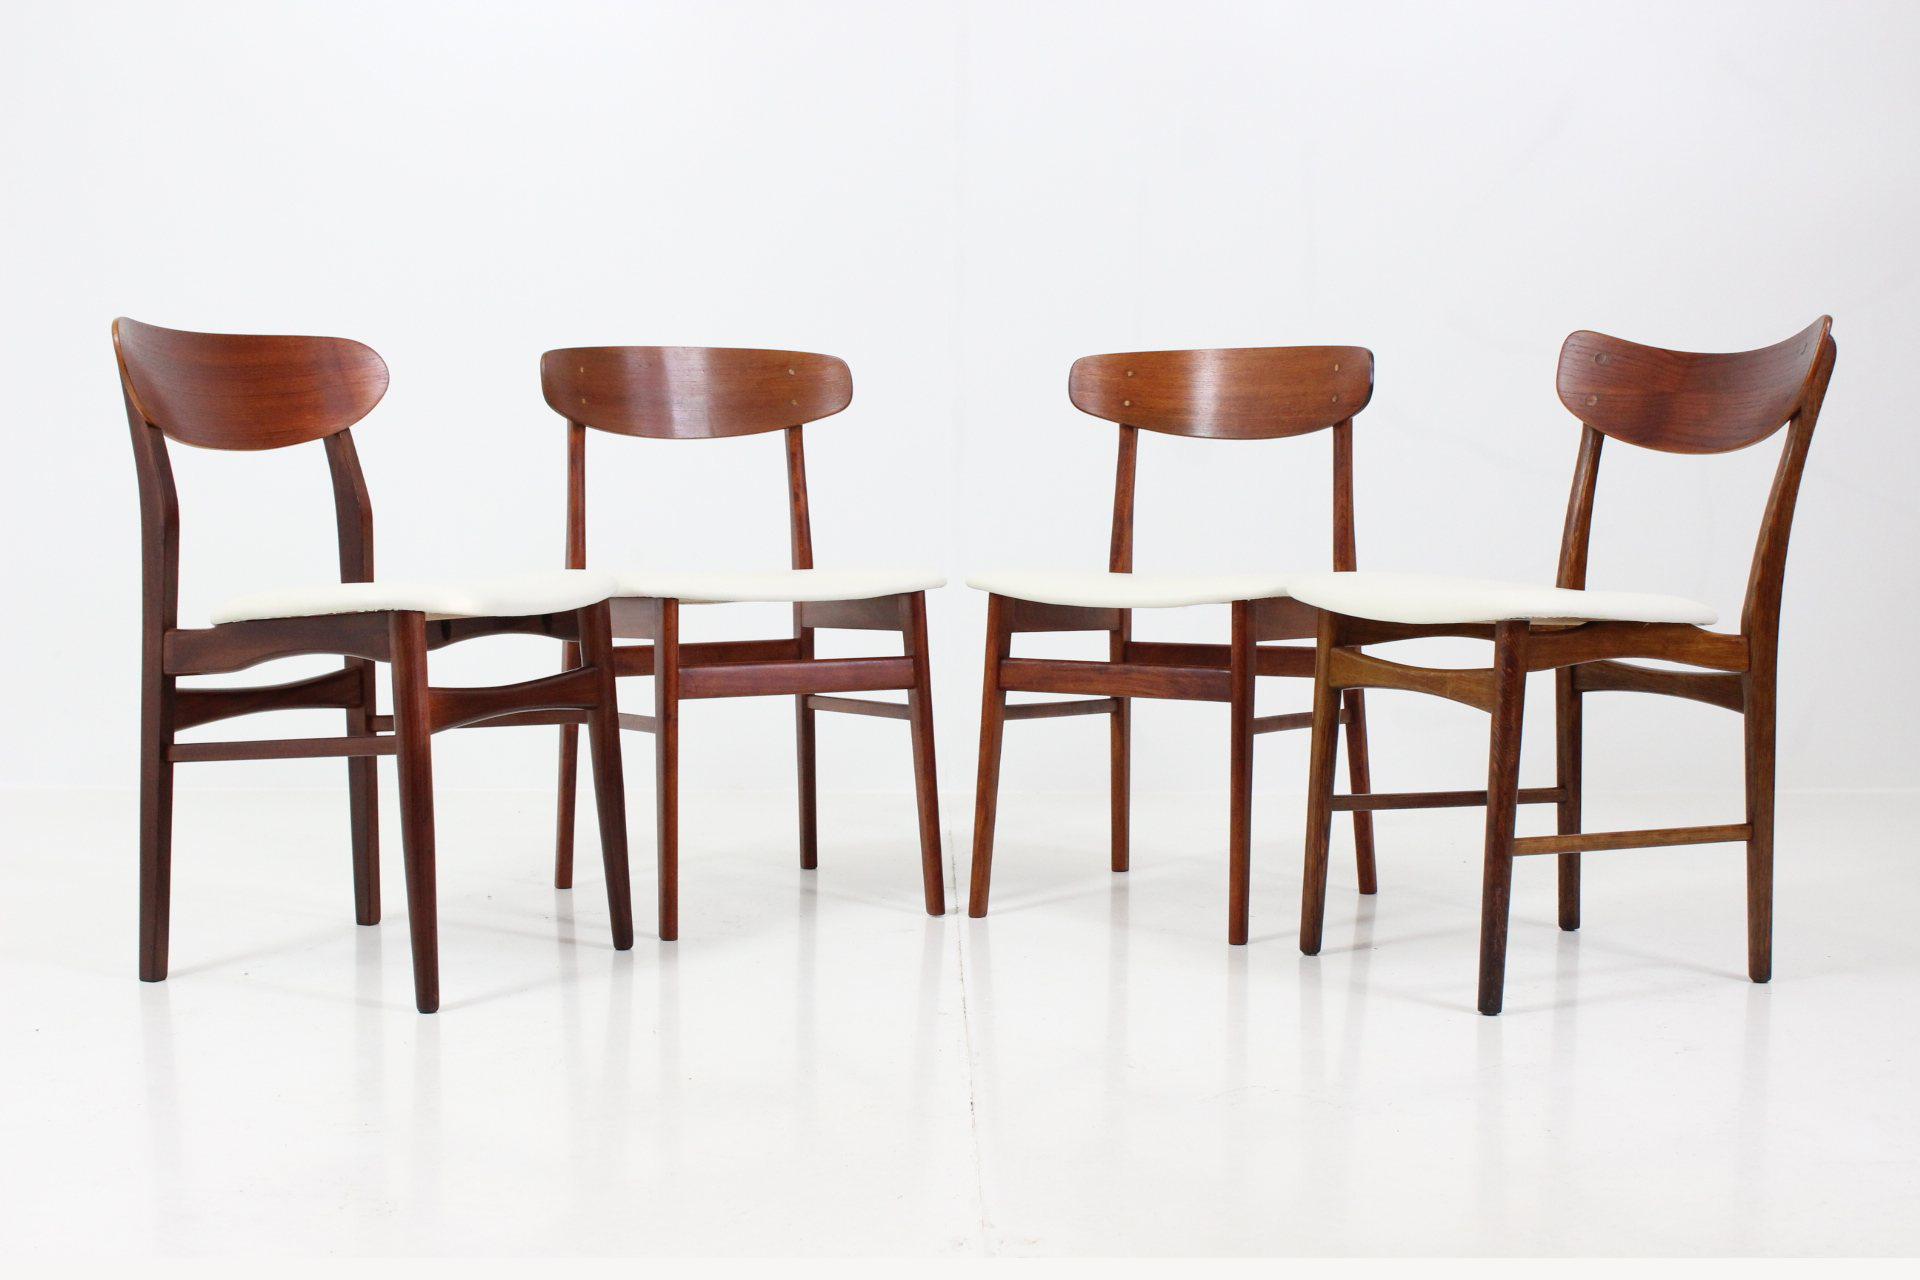 Vintage Dining Chairs by Illum Wikkelsø for Farstrup Savvaerk